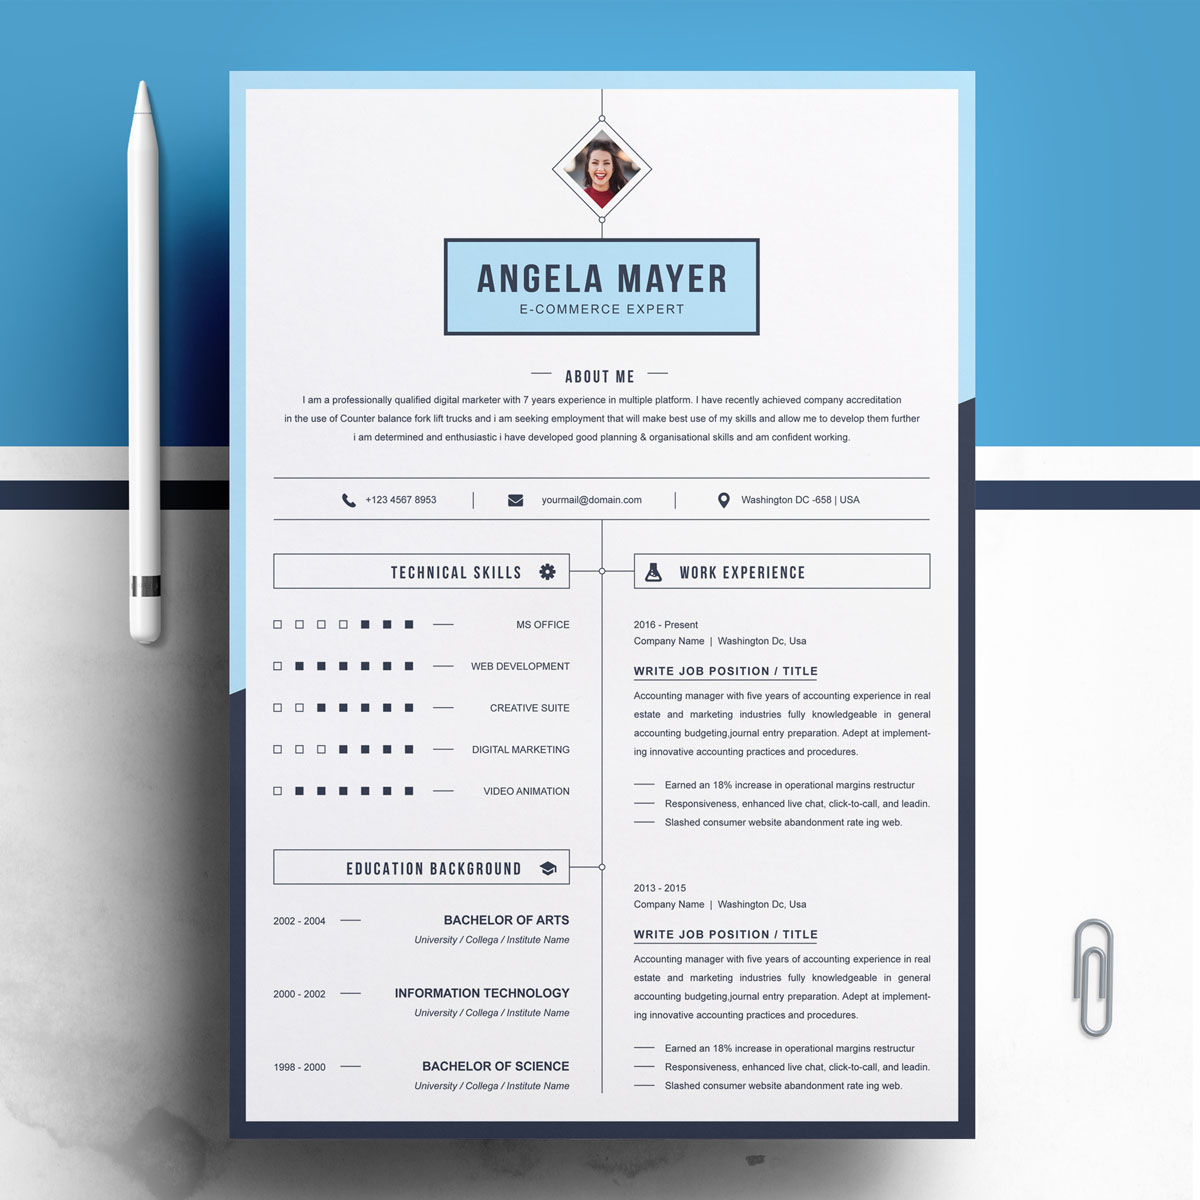 Angela Mayer Resume Template